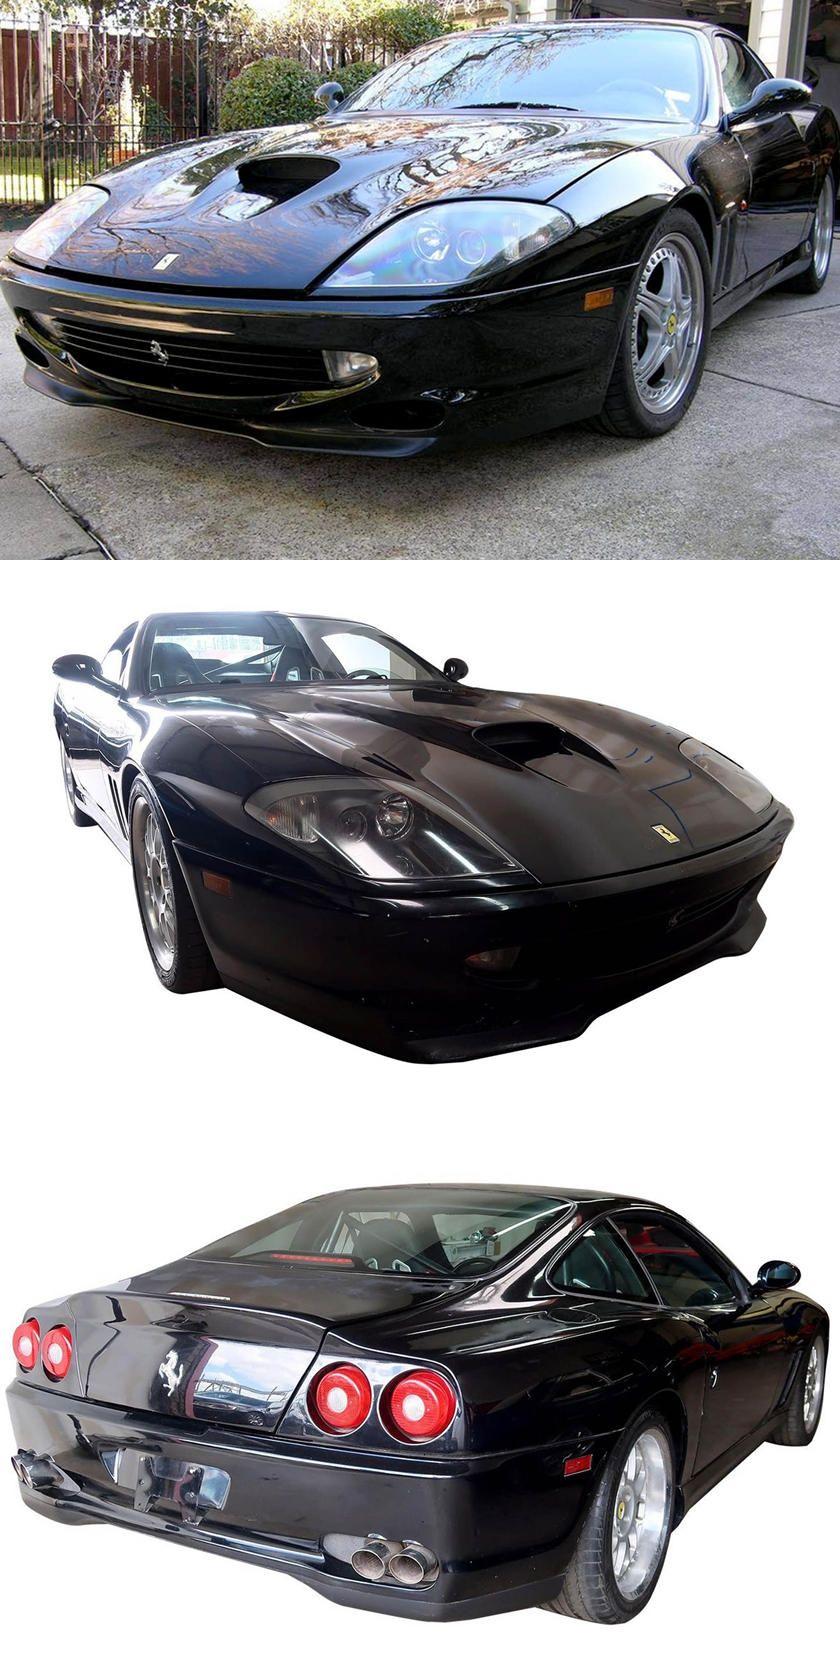 Van Halen S Custom Ferrari 550 Race Car For Sale It Could Fetch Up To 200000 In 2020 Ferrari Cars For Sale Car